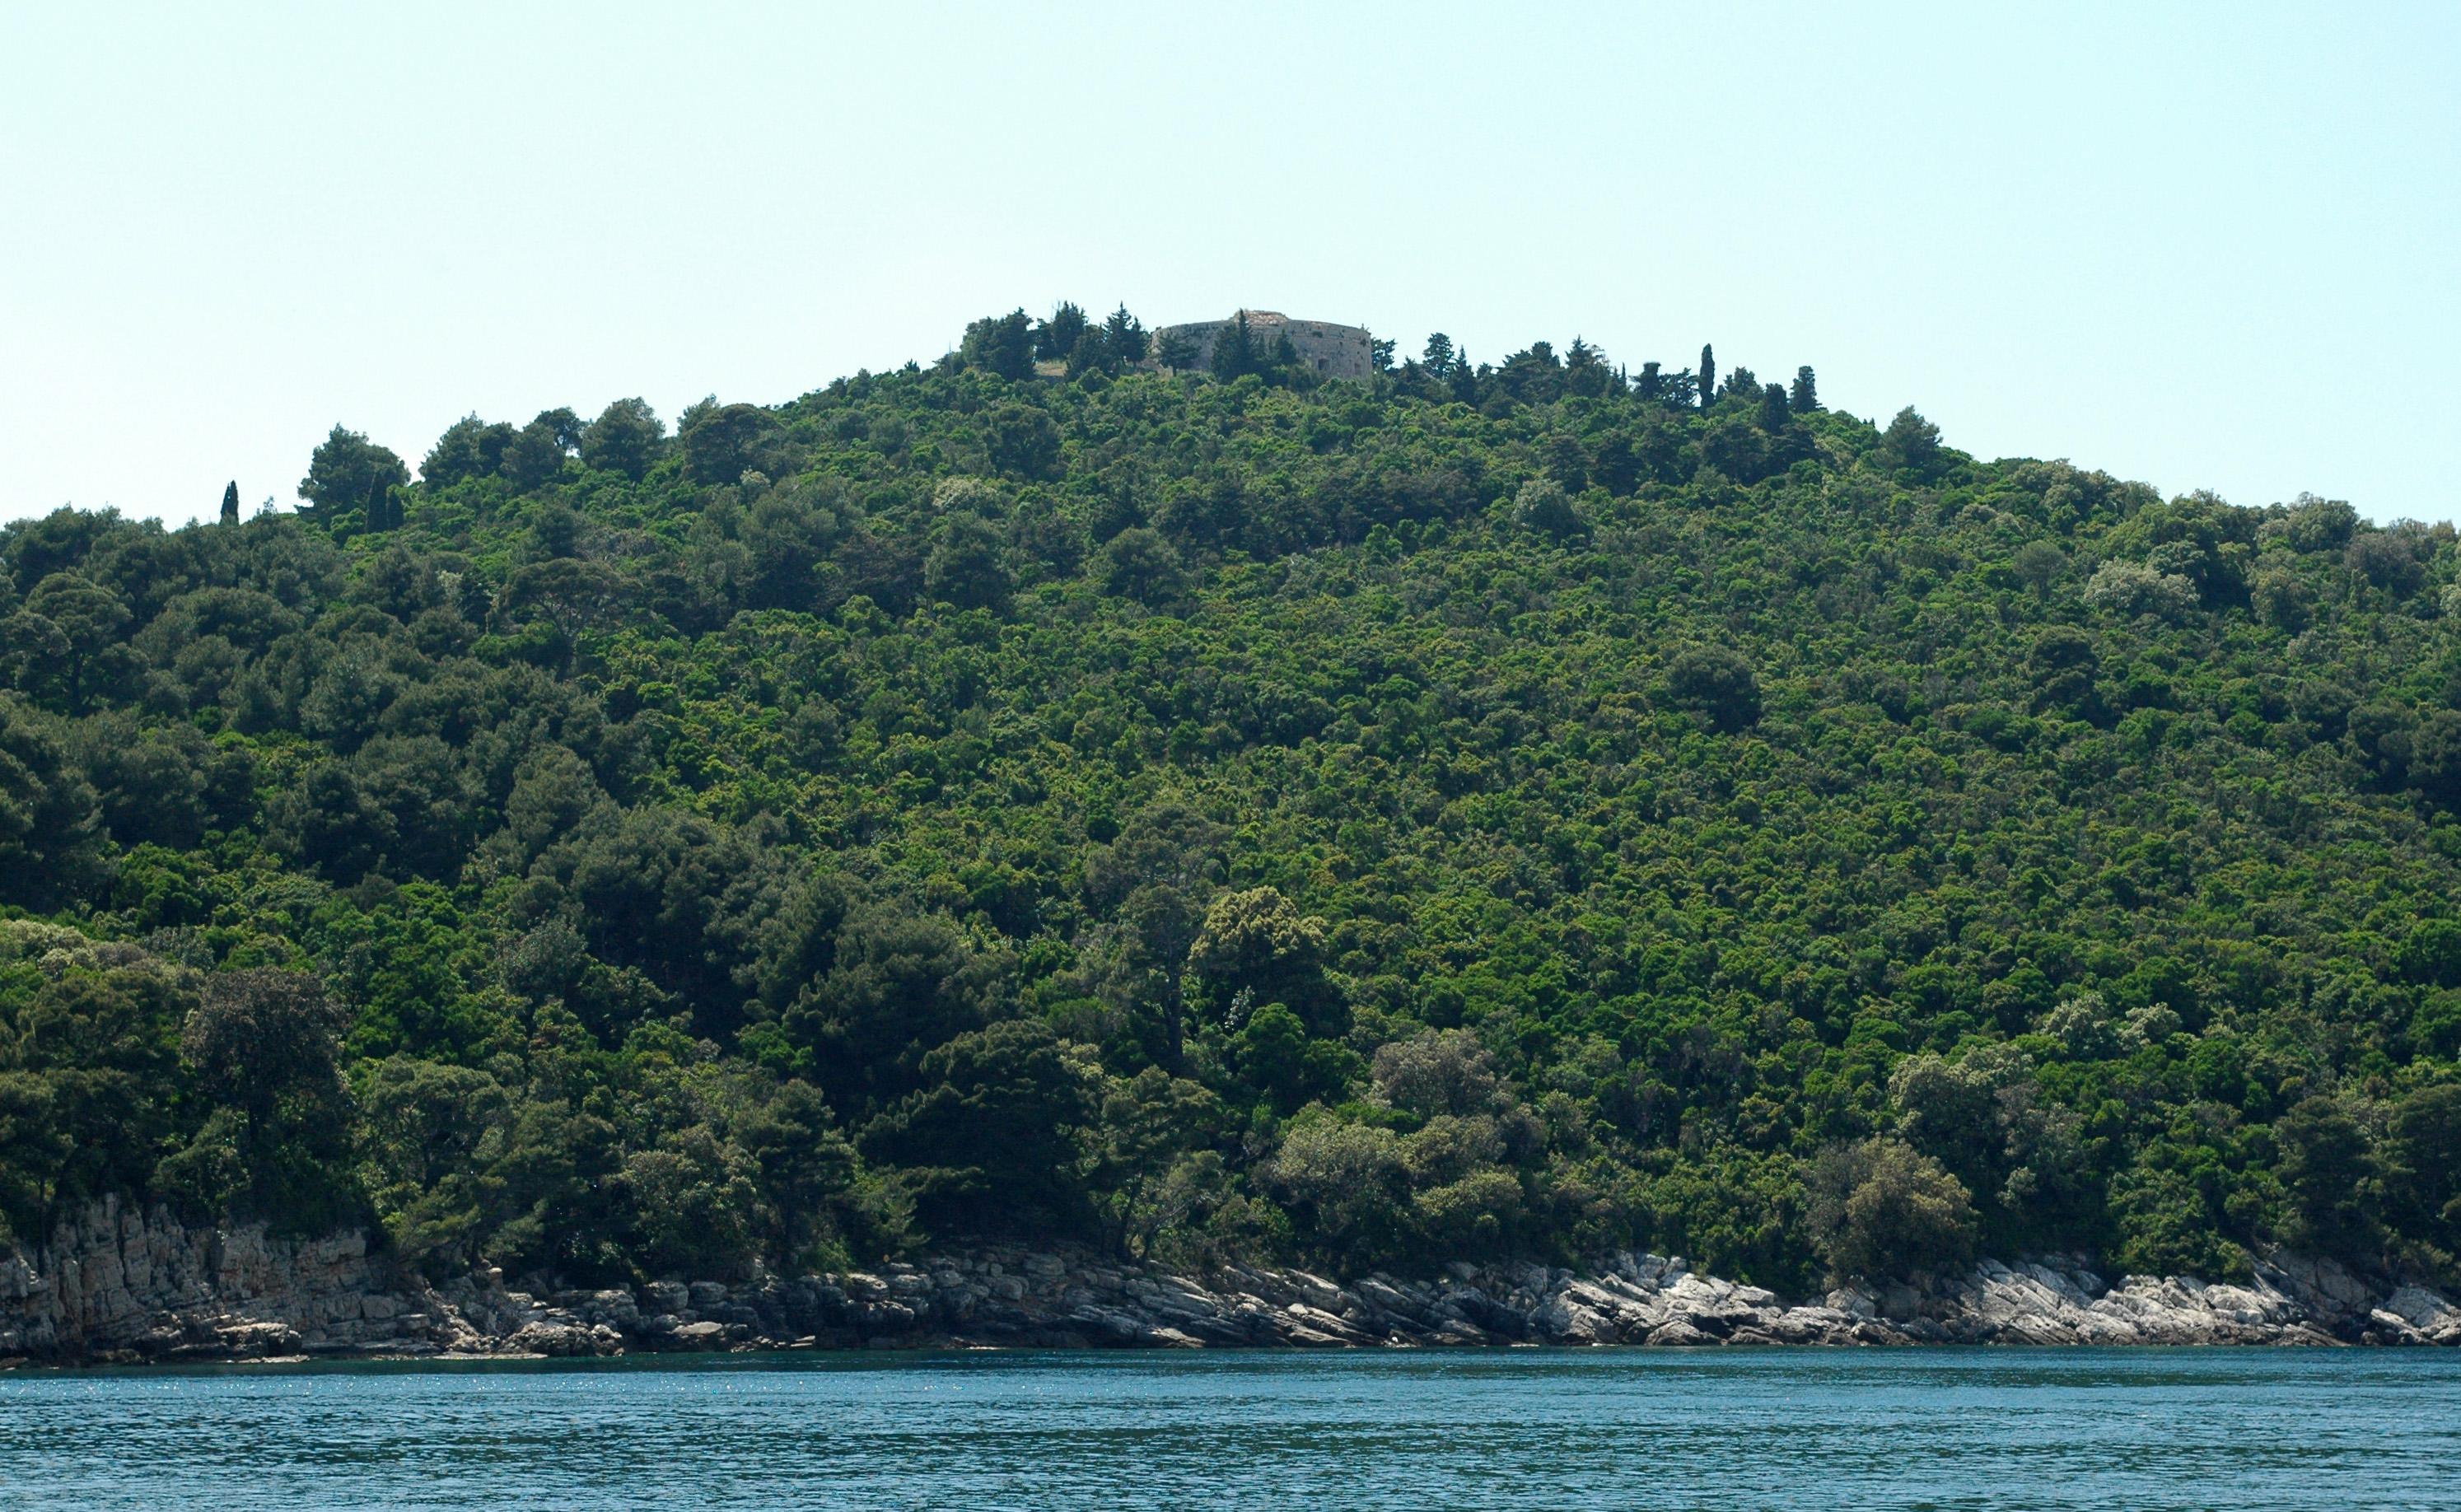 ile lokrum 018 fort royal vu depuis mer 2010 05 25